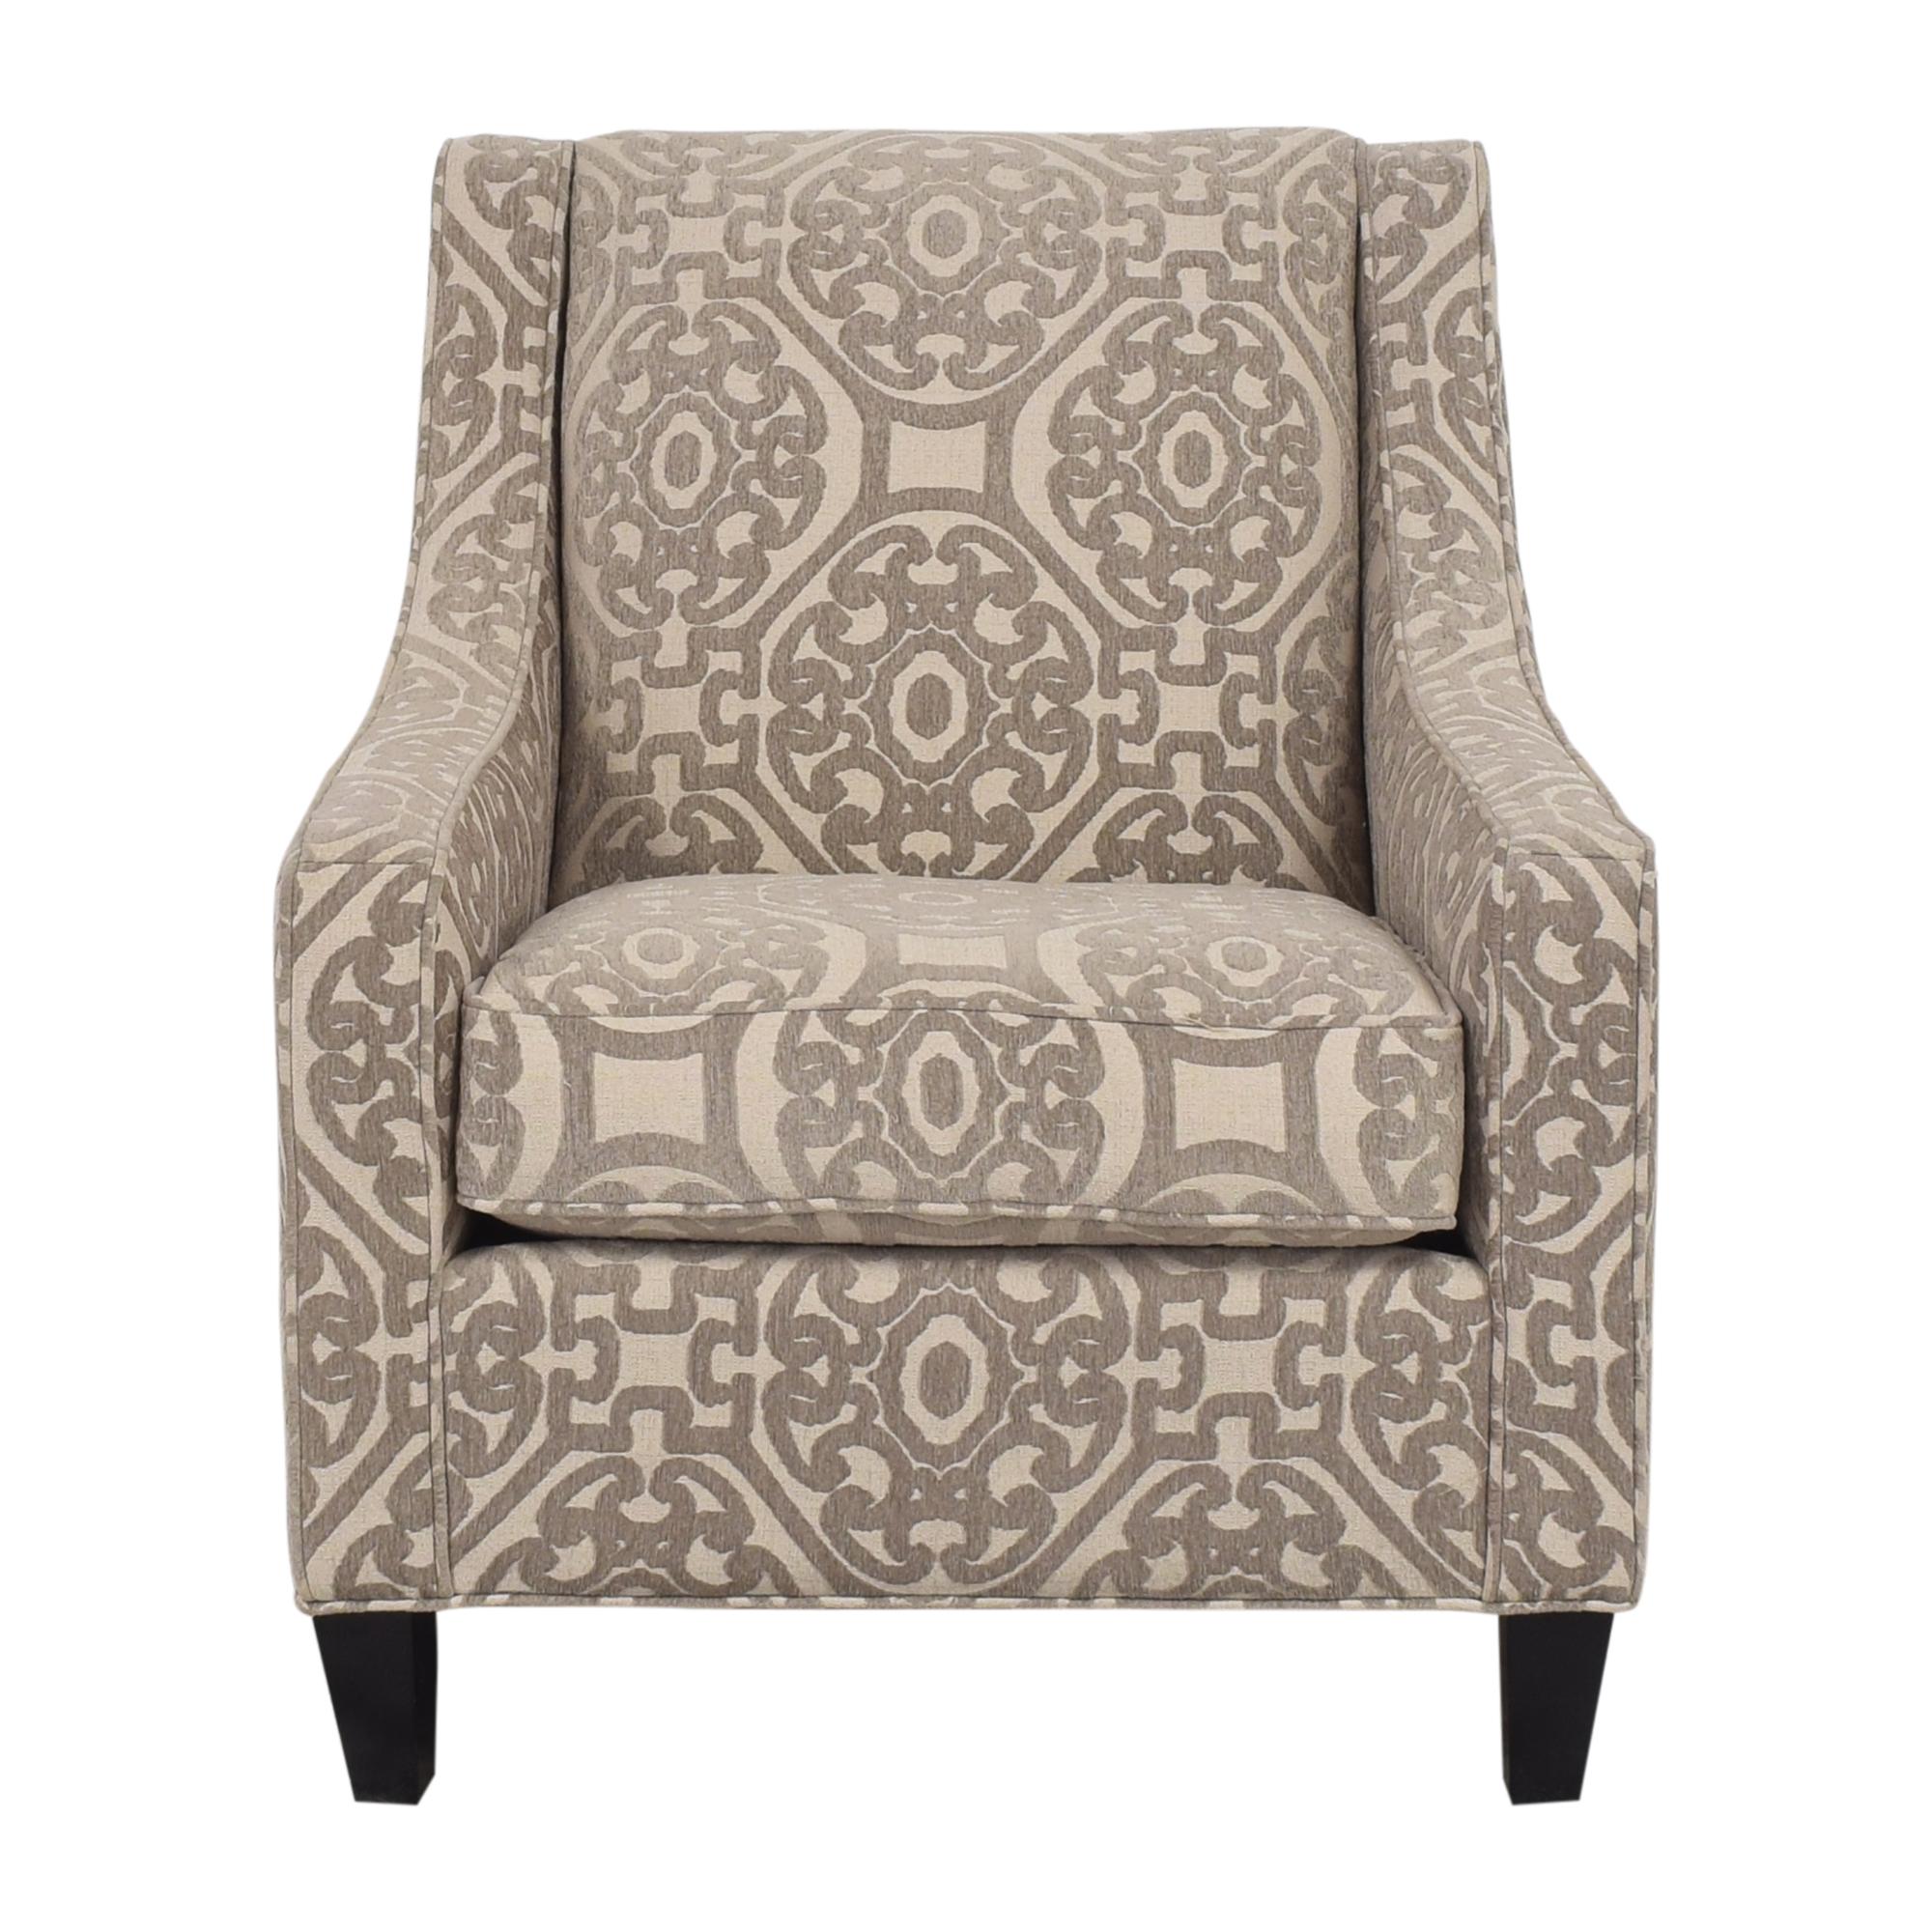 Raymour & Flanigan Raymour & Flanigan Cindy Crawford Home Calista Chair nyc